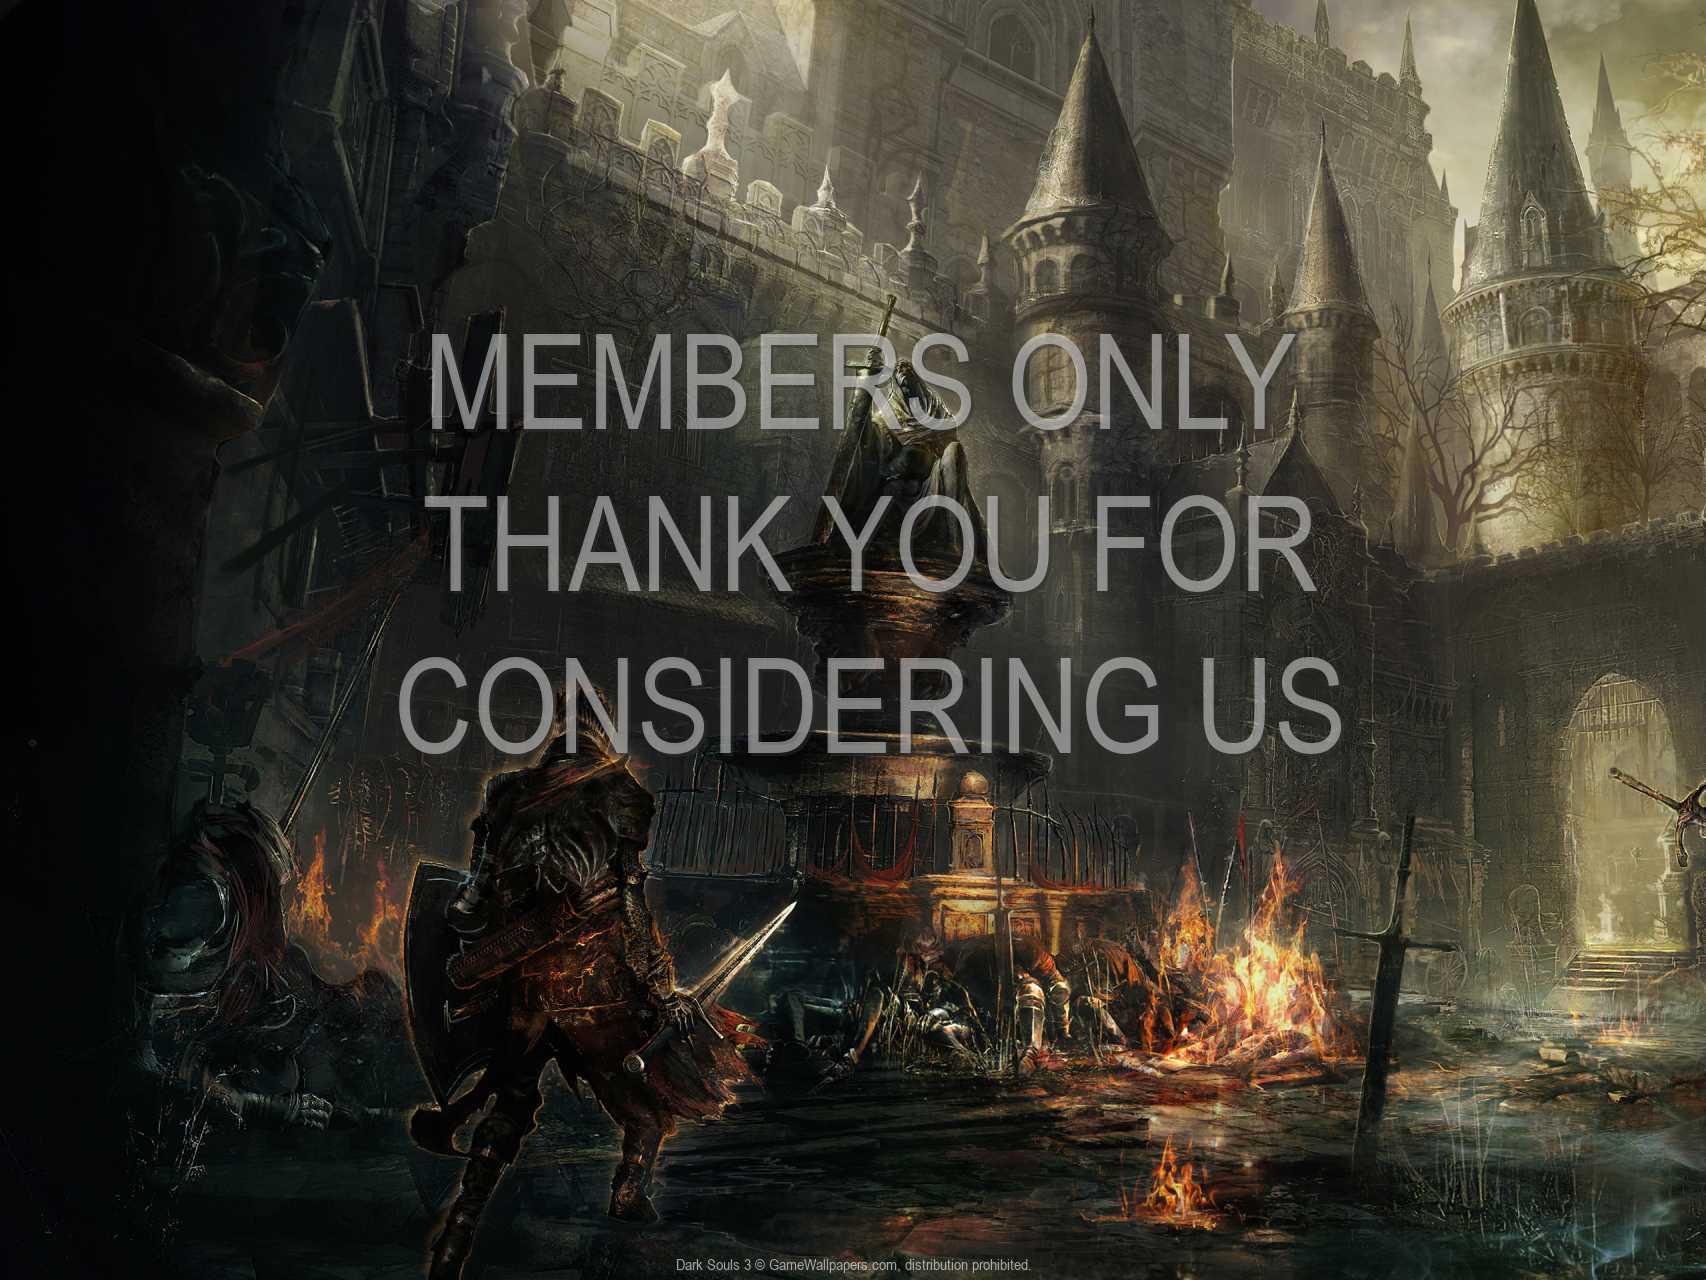 Dark Souls 3 720p Horizontal Handy Hintergrundbild 01